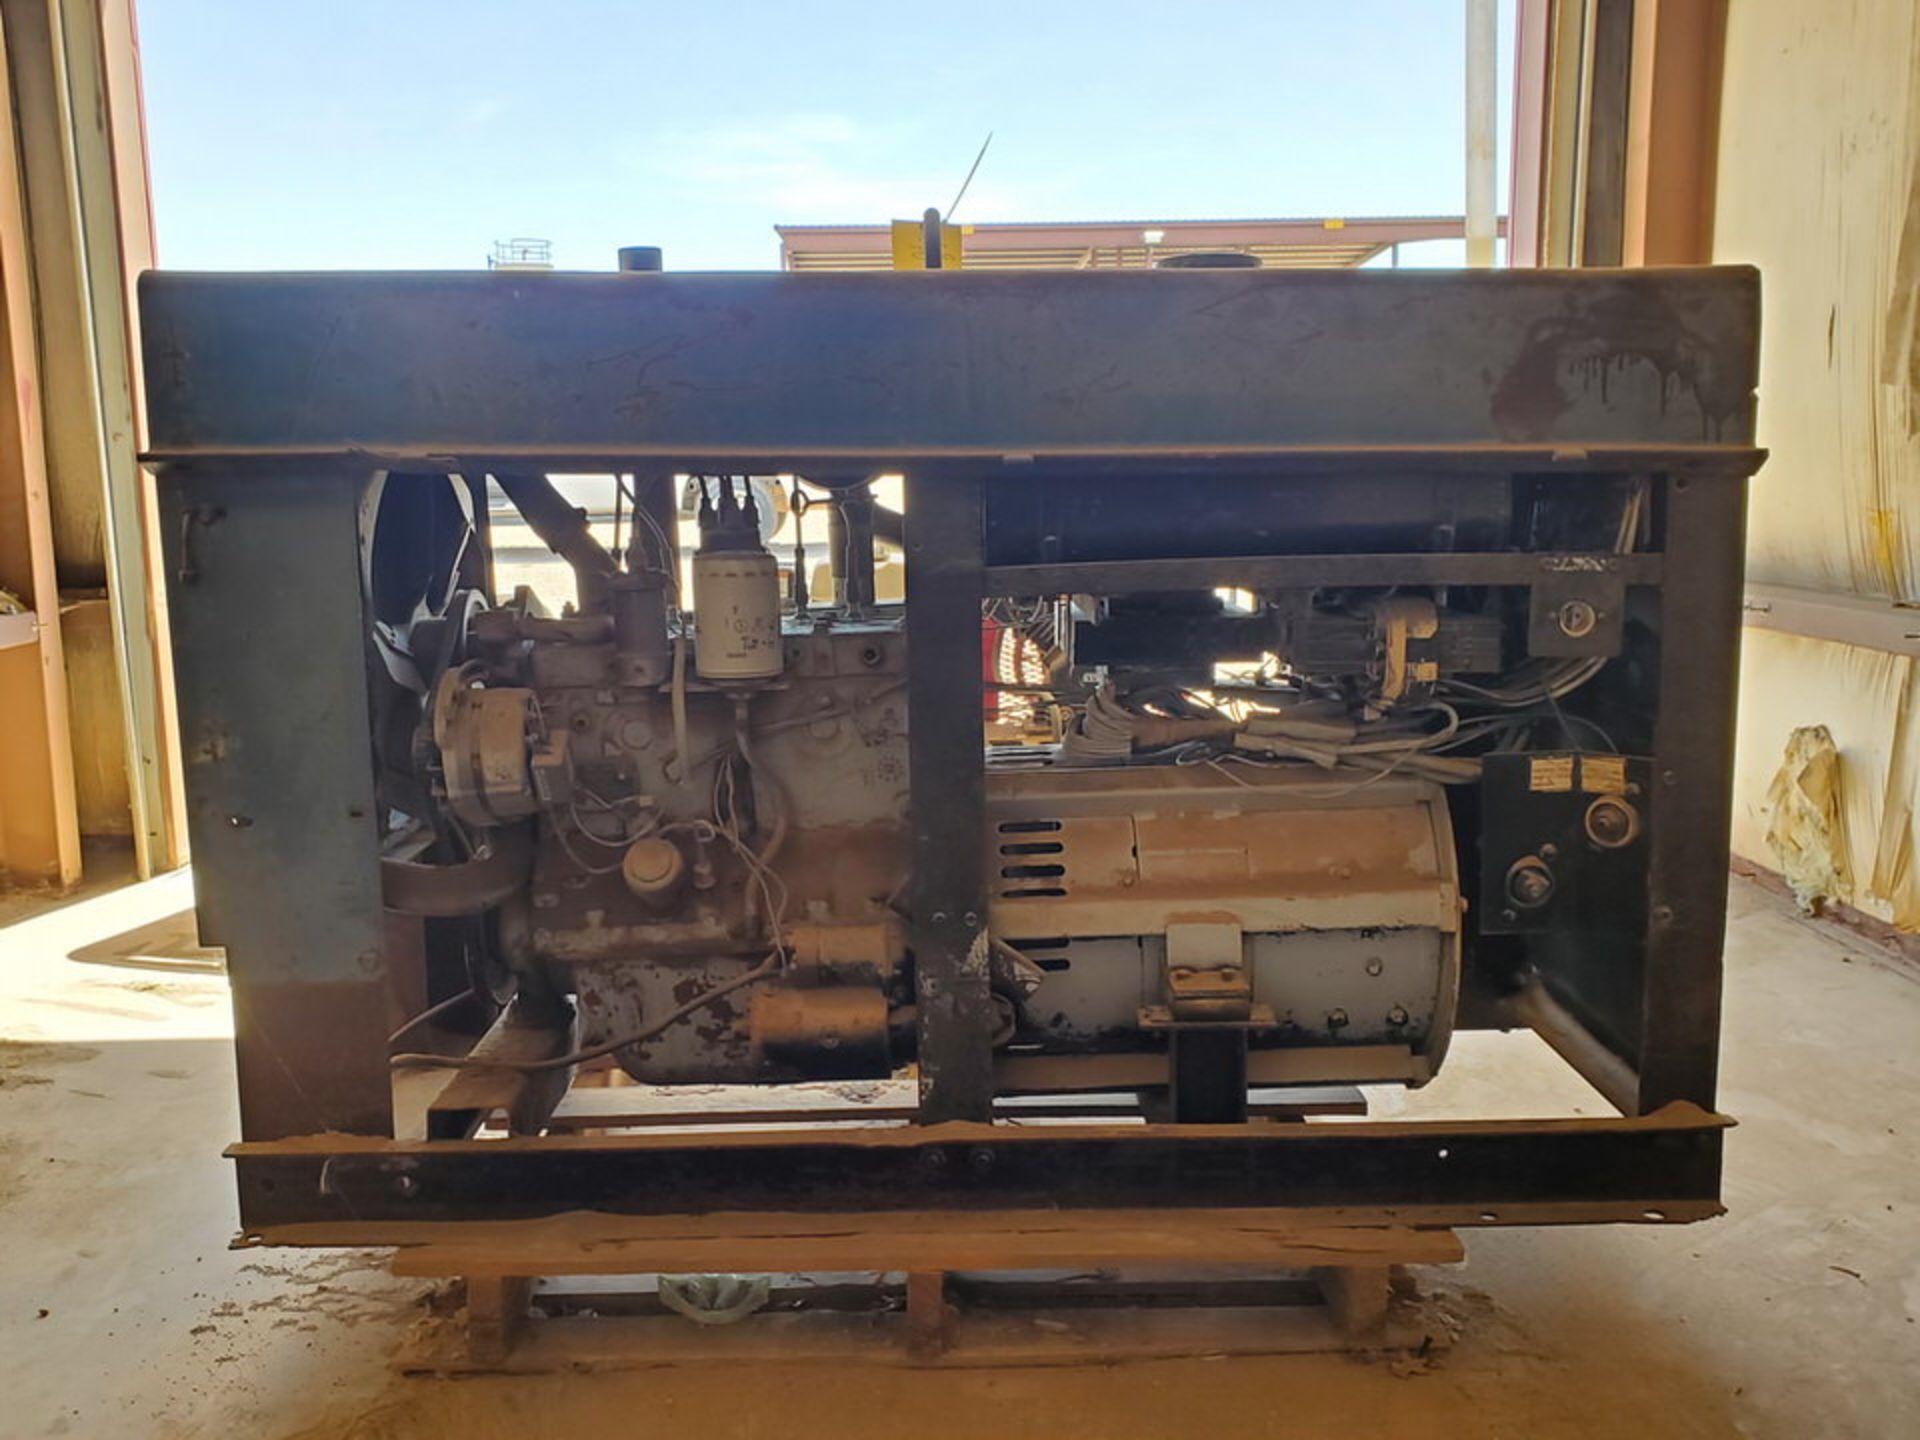 Miller Big 20 Welder Generator CC/DC: 20-750A, CC/AC: 20-575A - Image 3 of 8